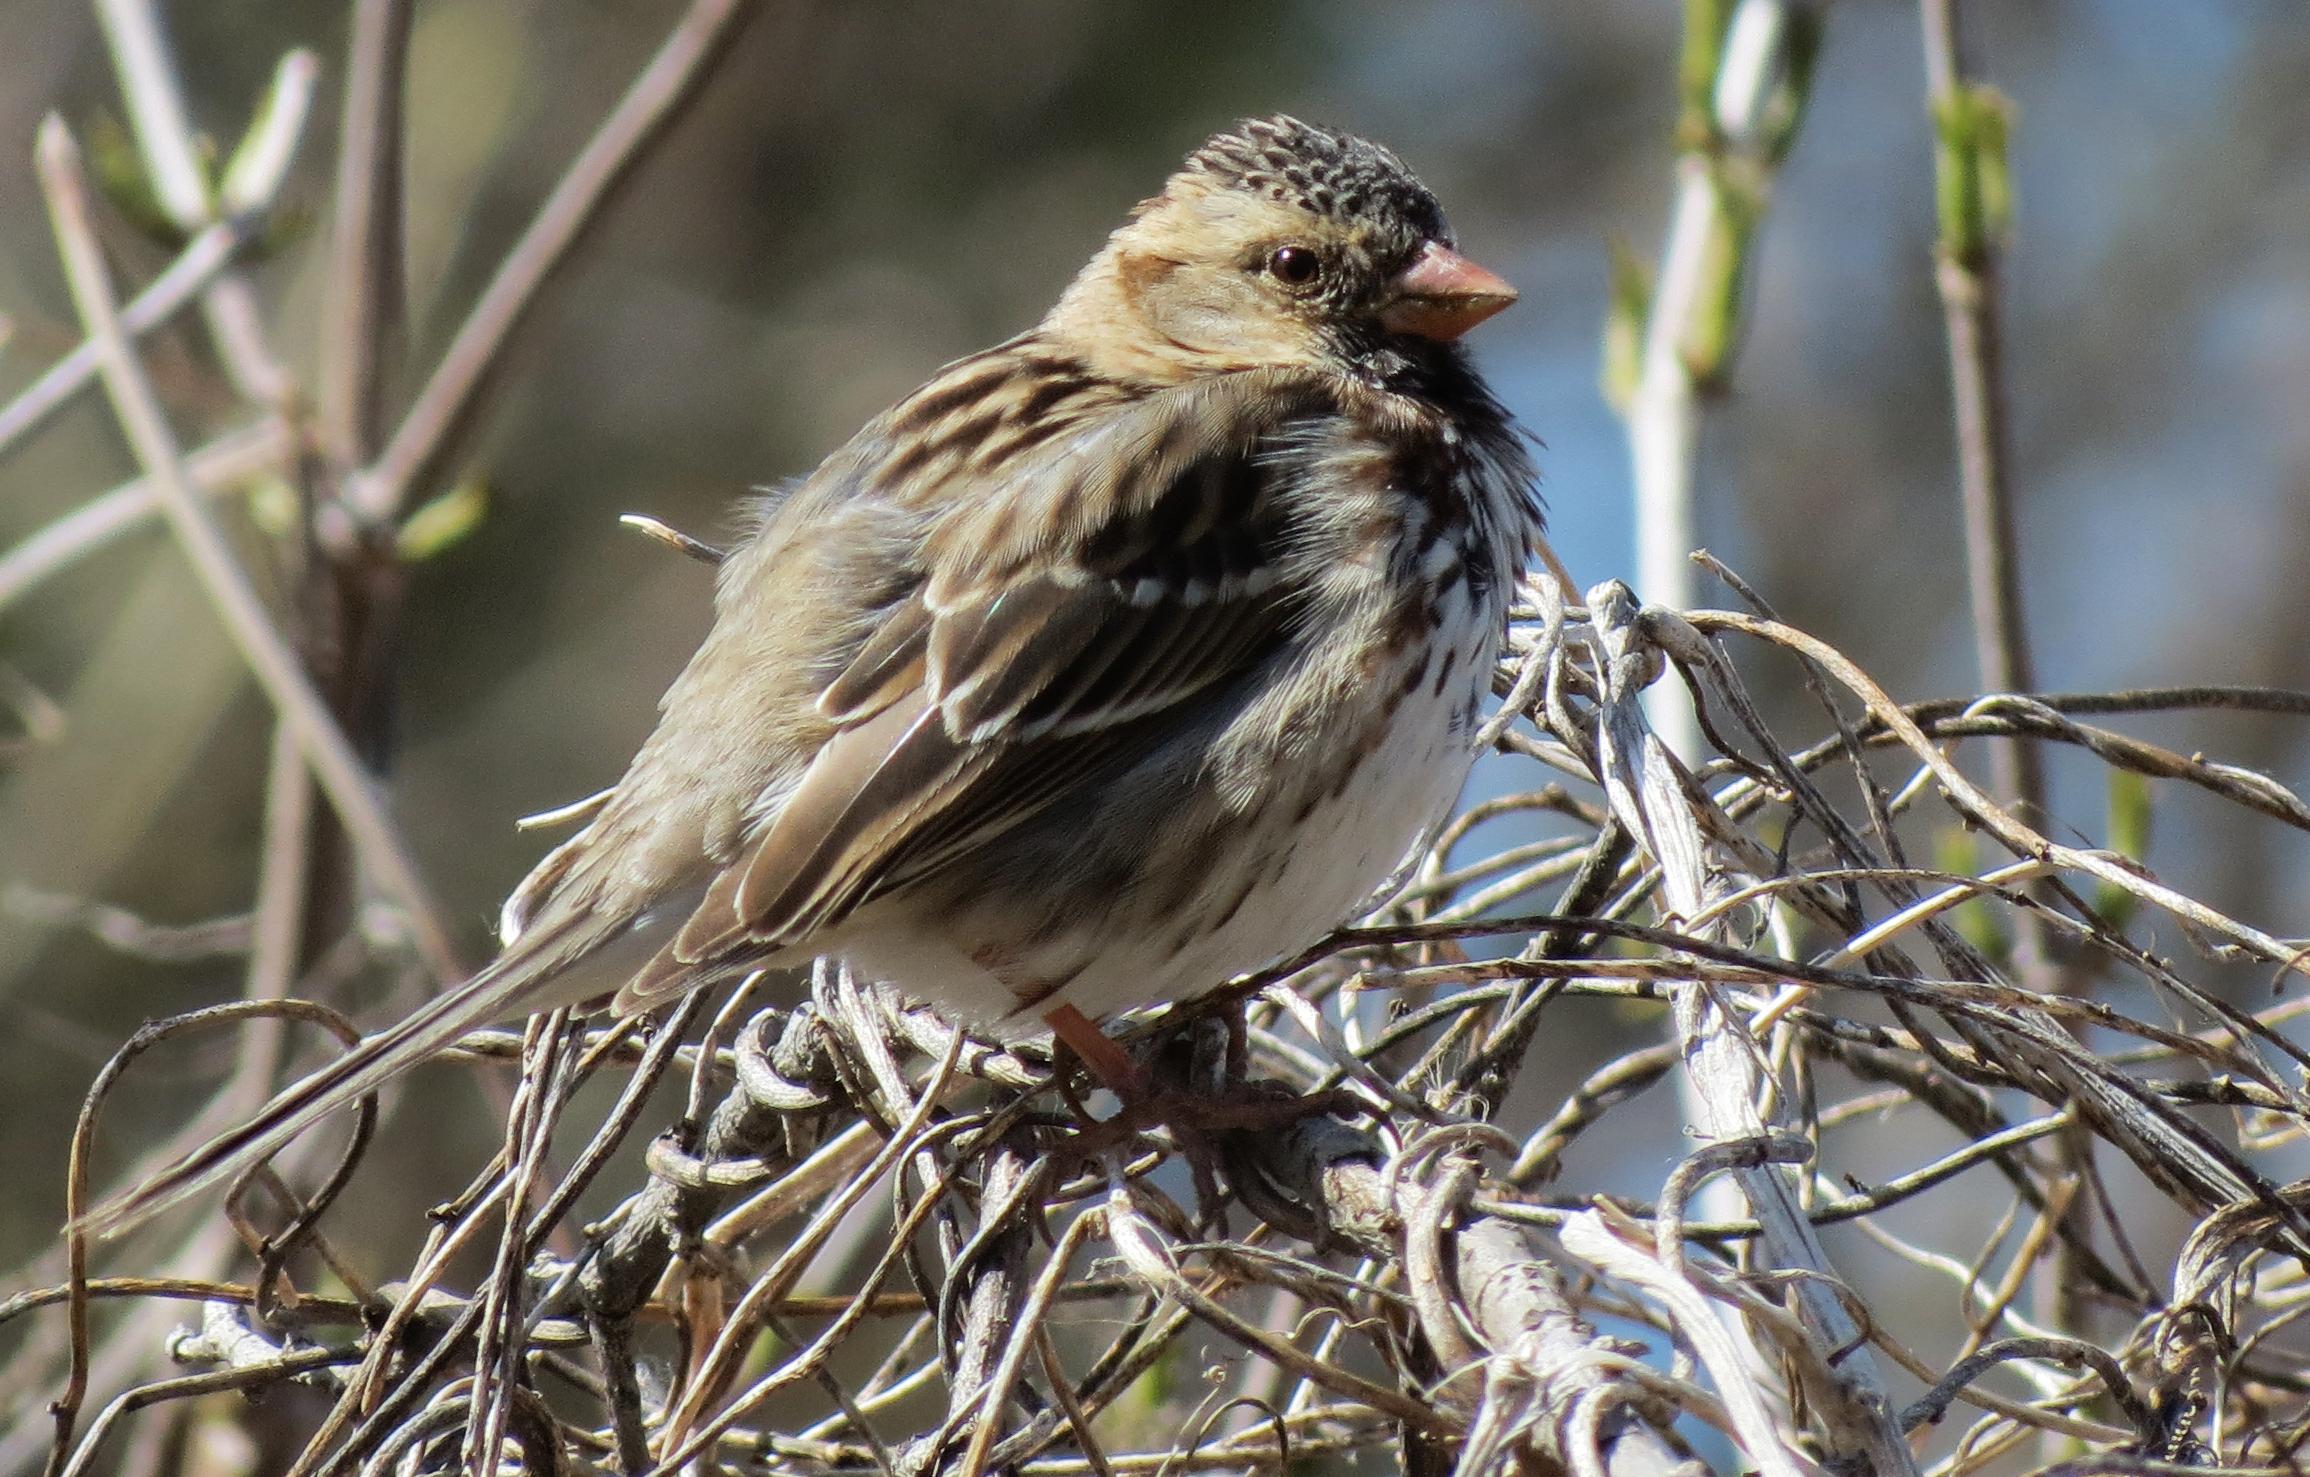 Song Sparrowtroysoderberg